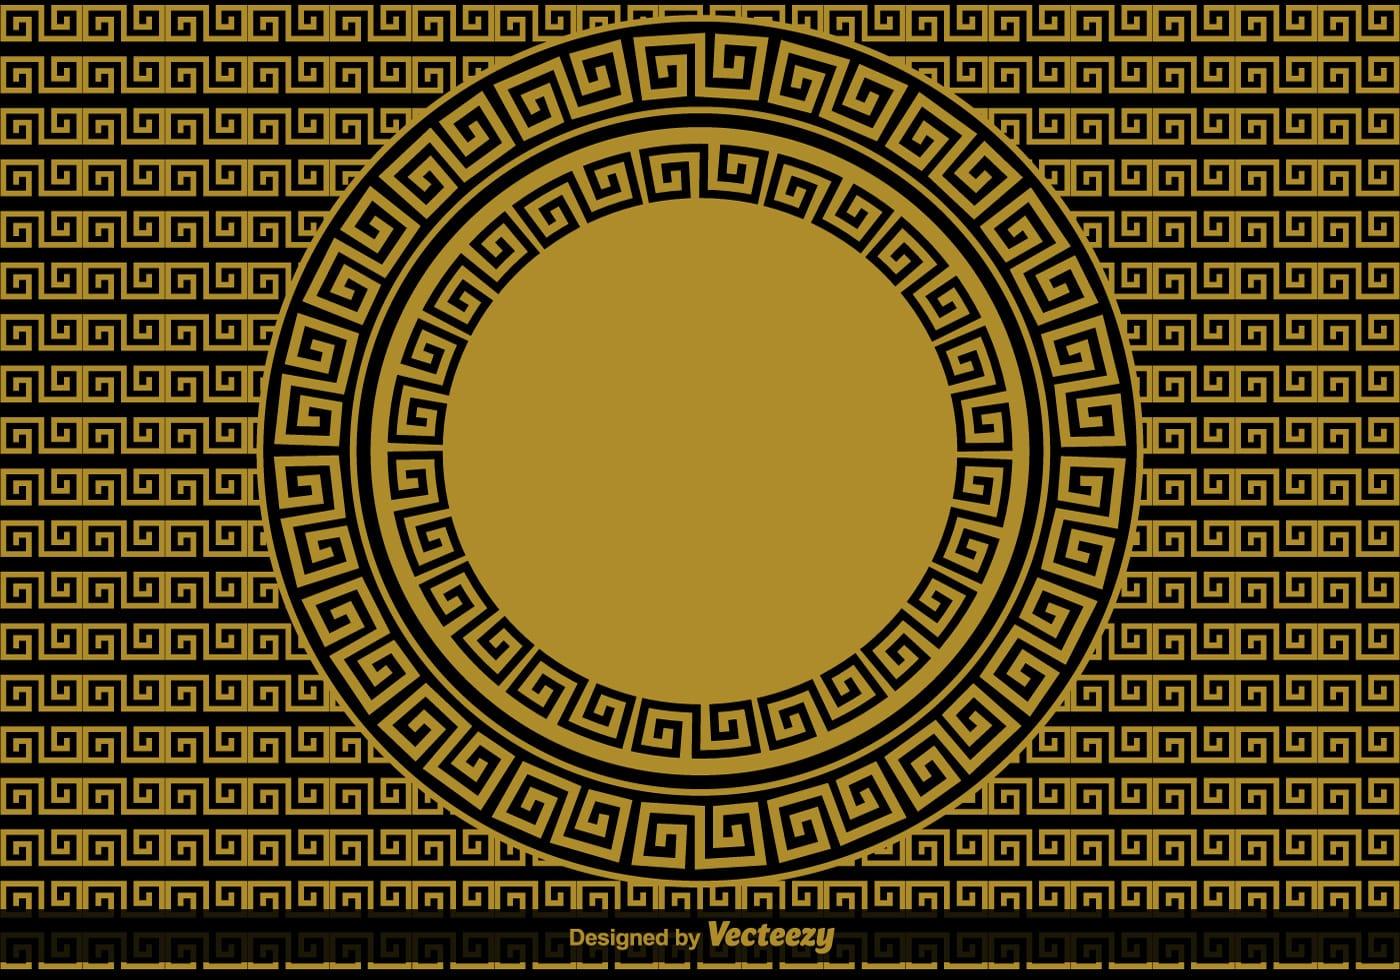 greek key vector background download free vector art